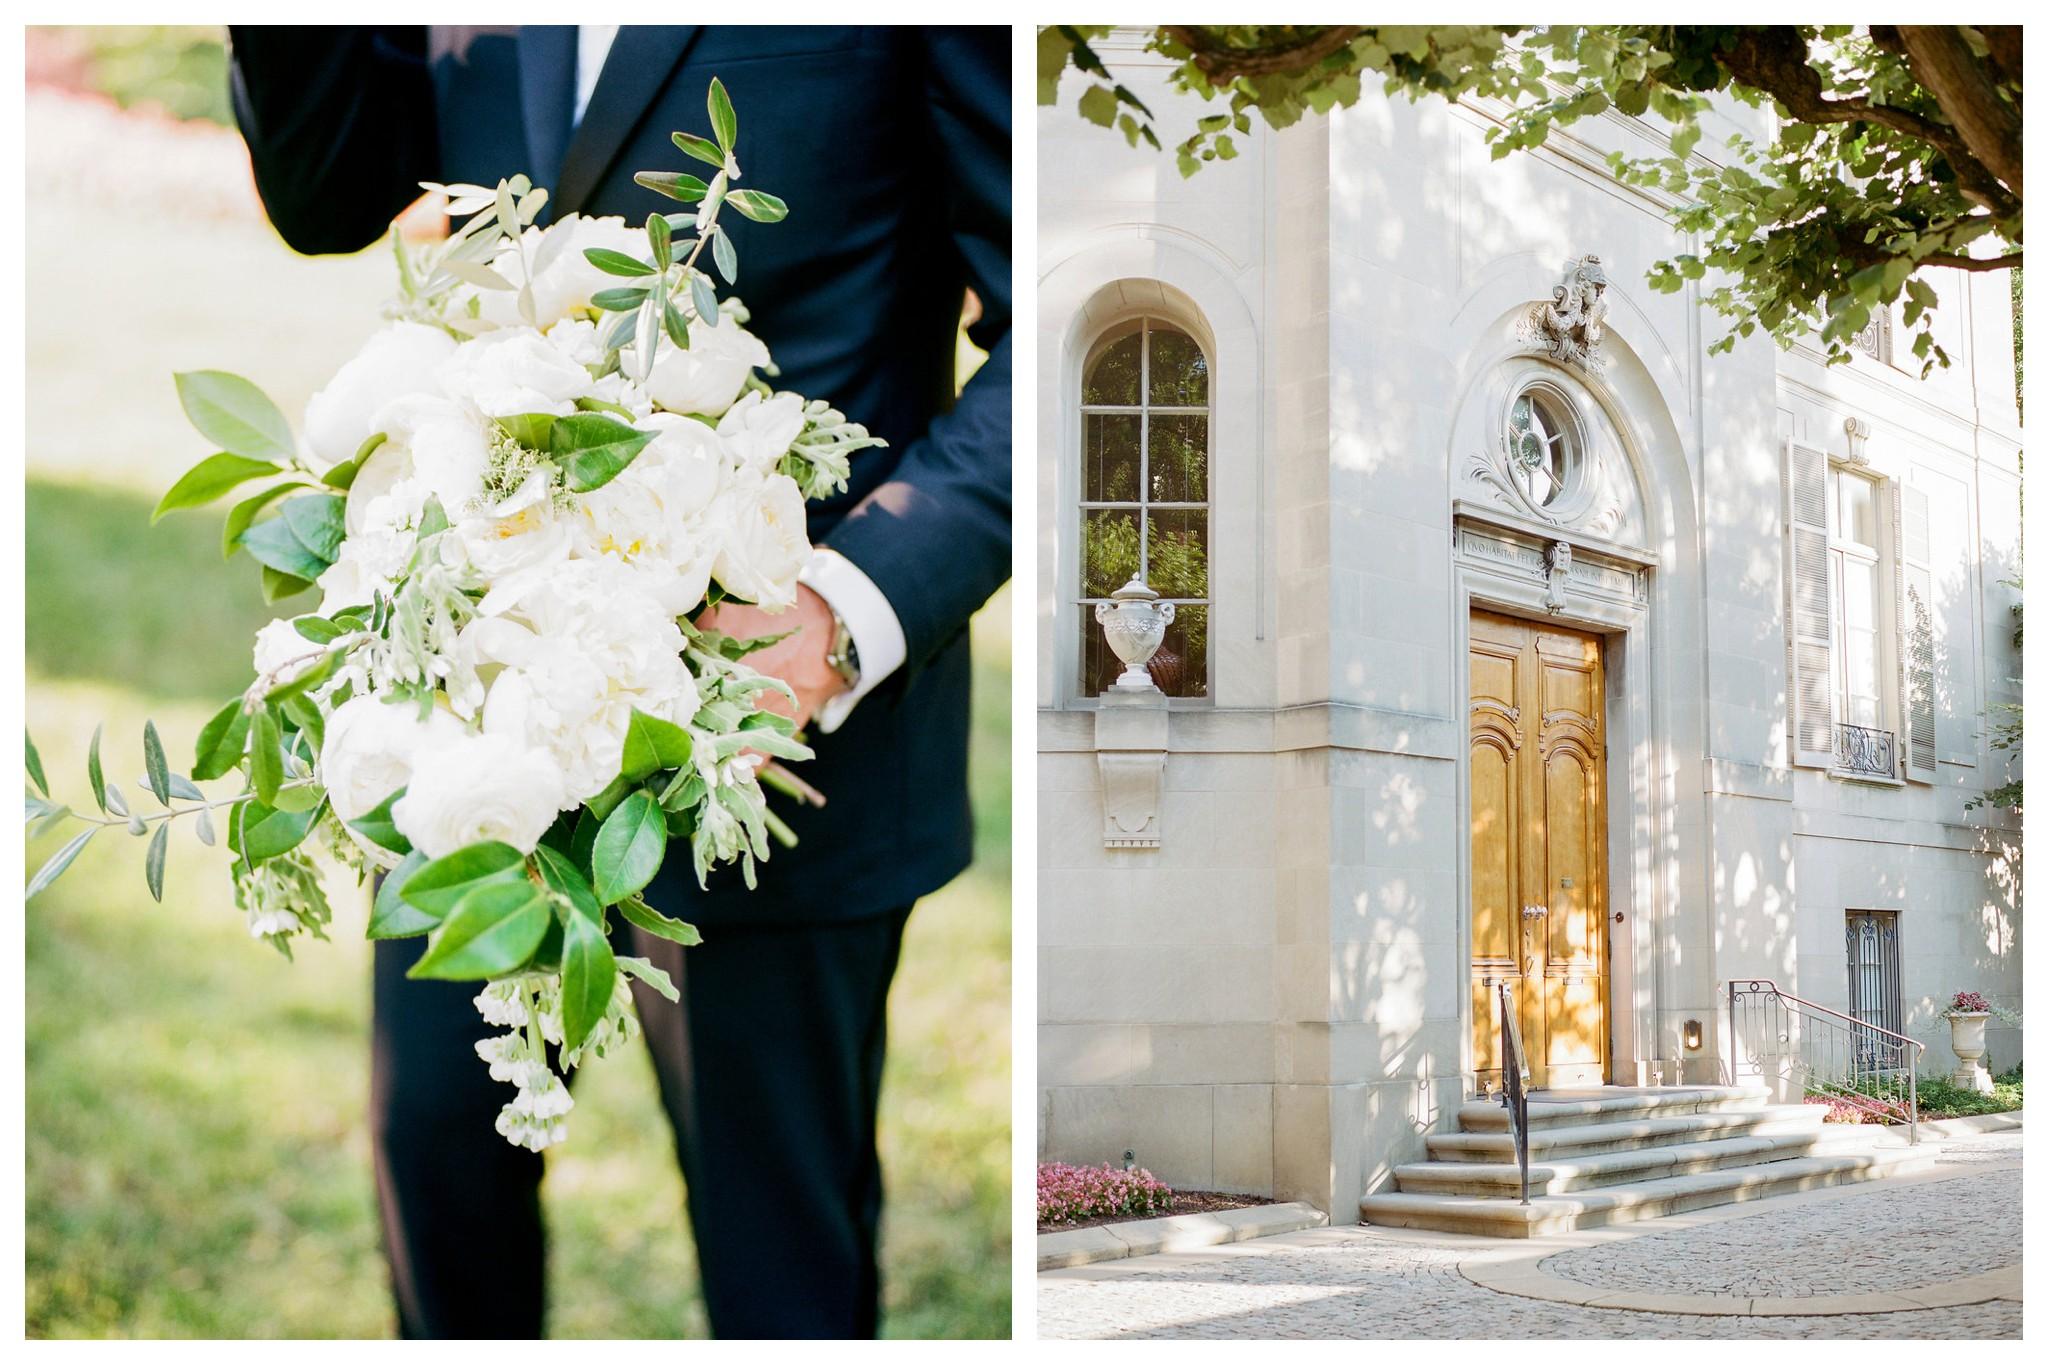 Summer Wedding at Meridian House in Washington DC by fine art photographer Lissa Ryan Photography